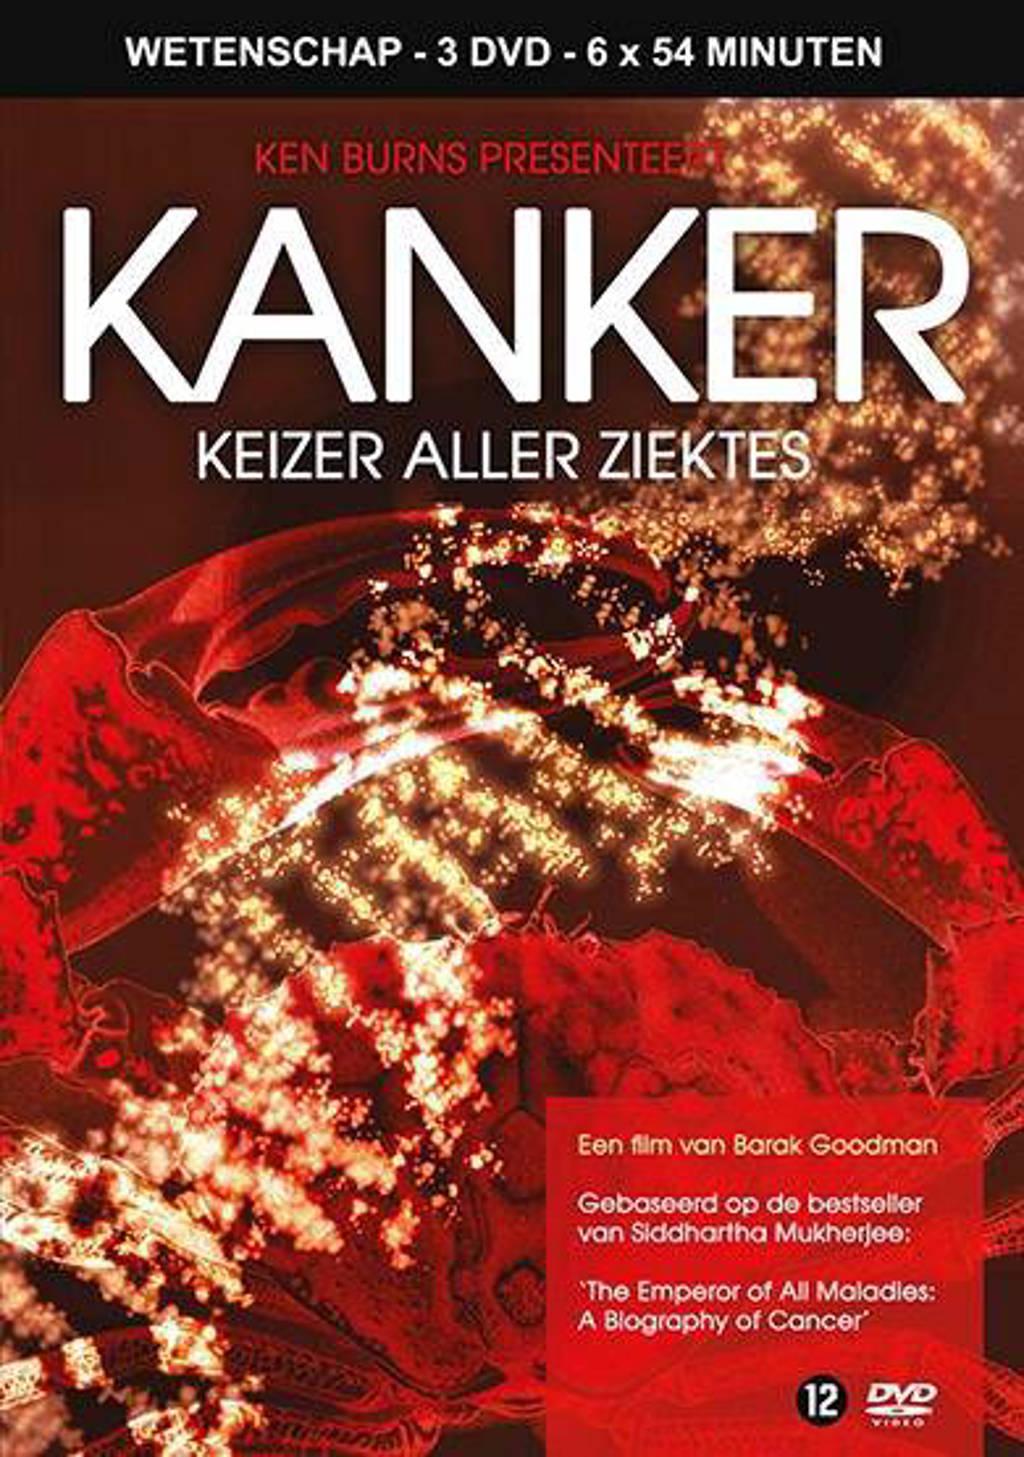 Kanker - Keizer aller ziektes (DVD)